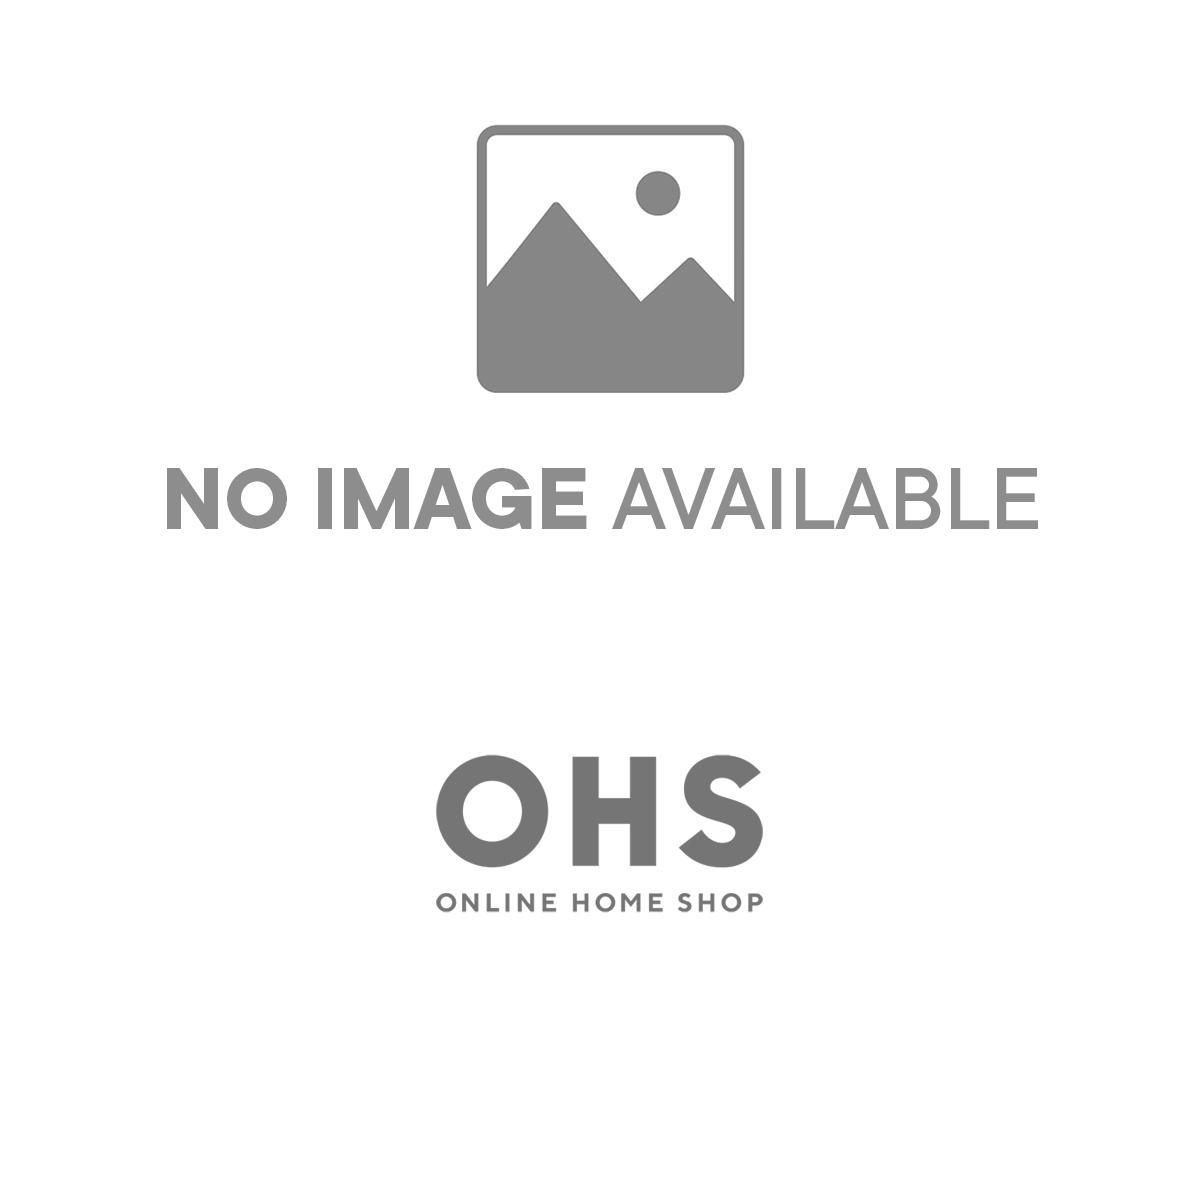 Brentfords Pinsonic Diamond Duvet Cover Set - Charcoal Grey